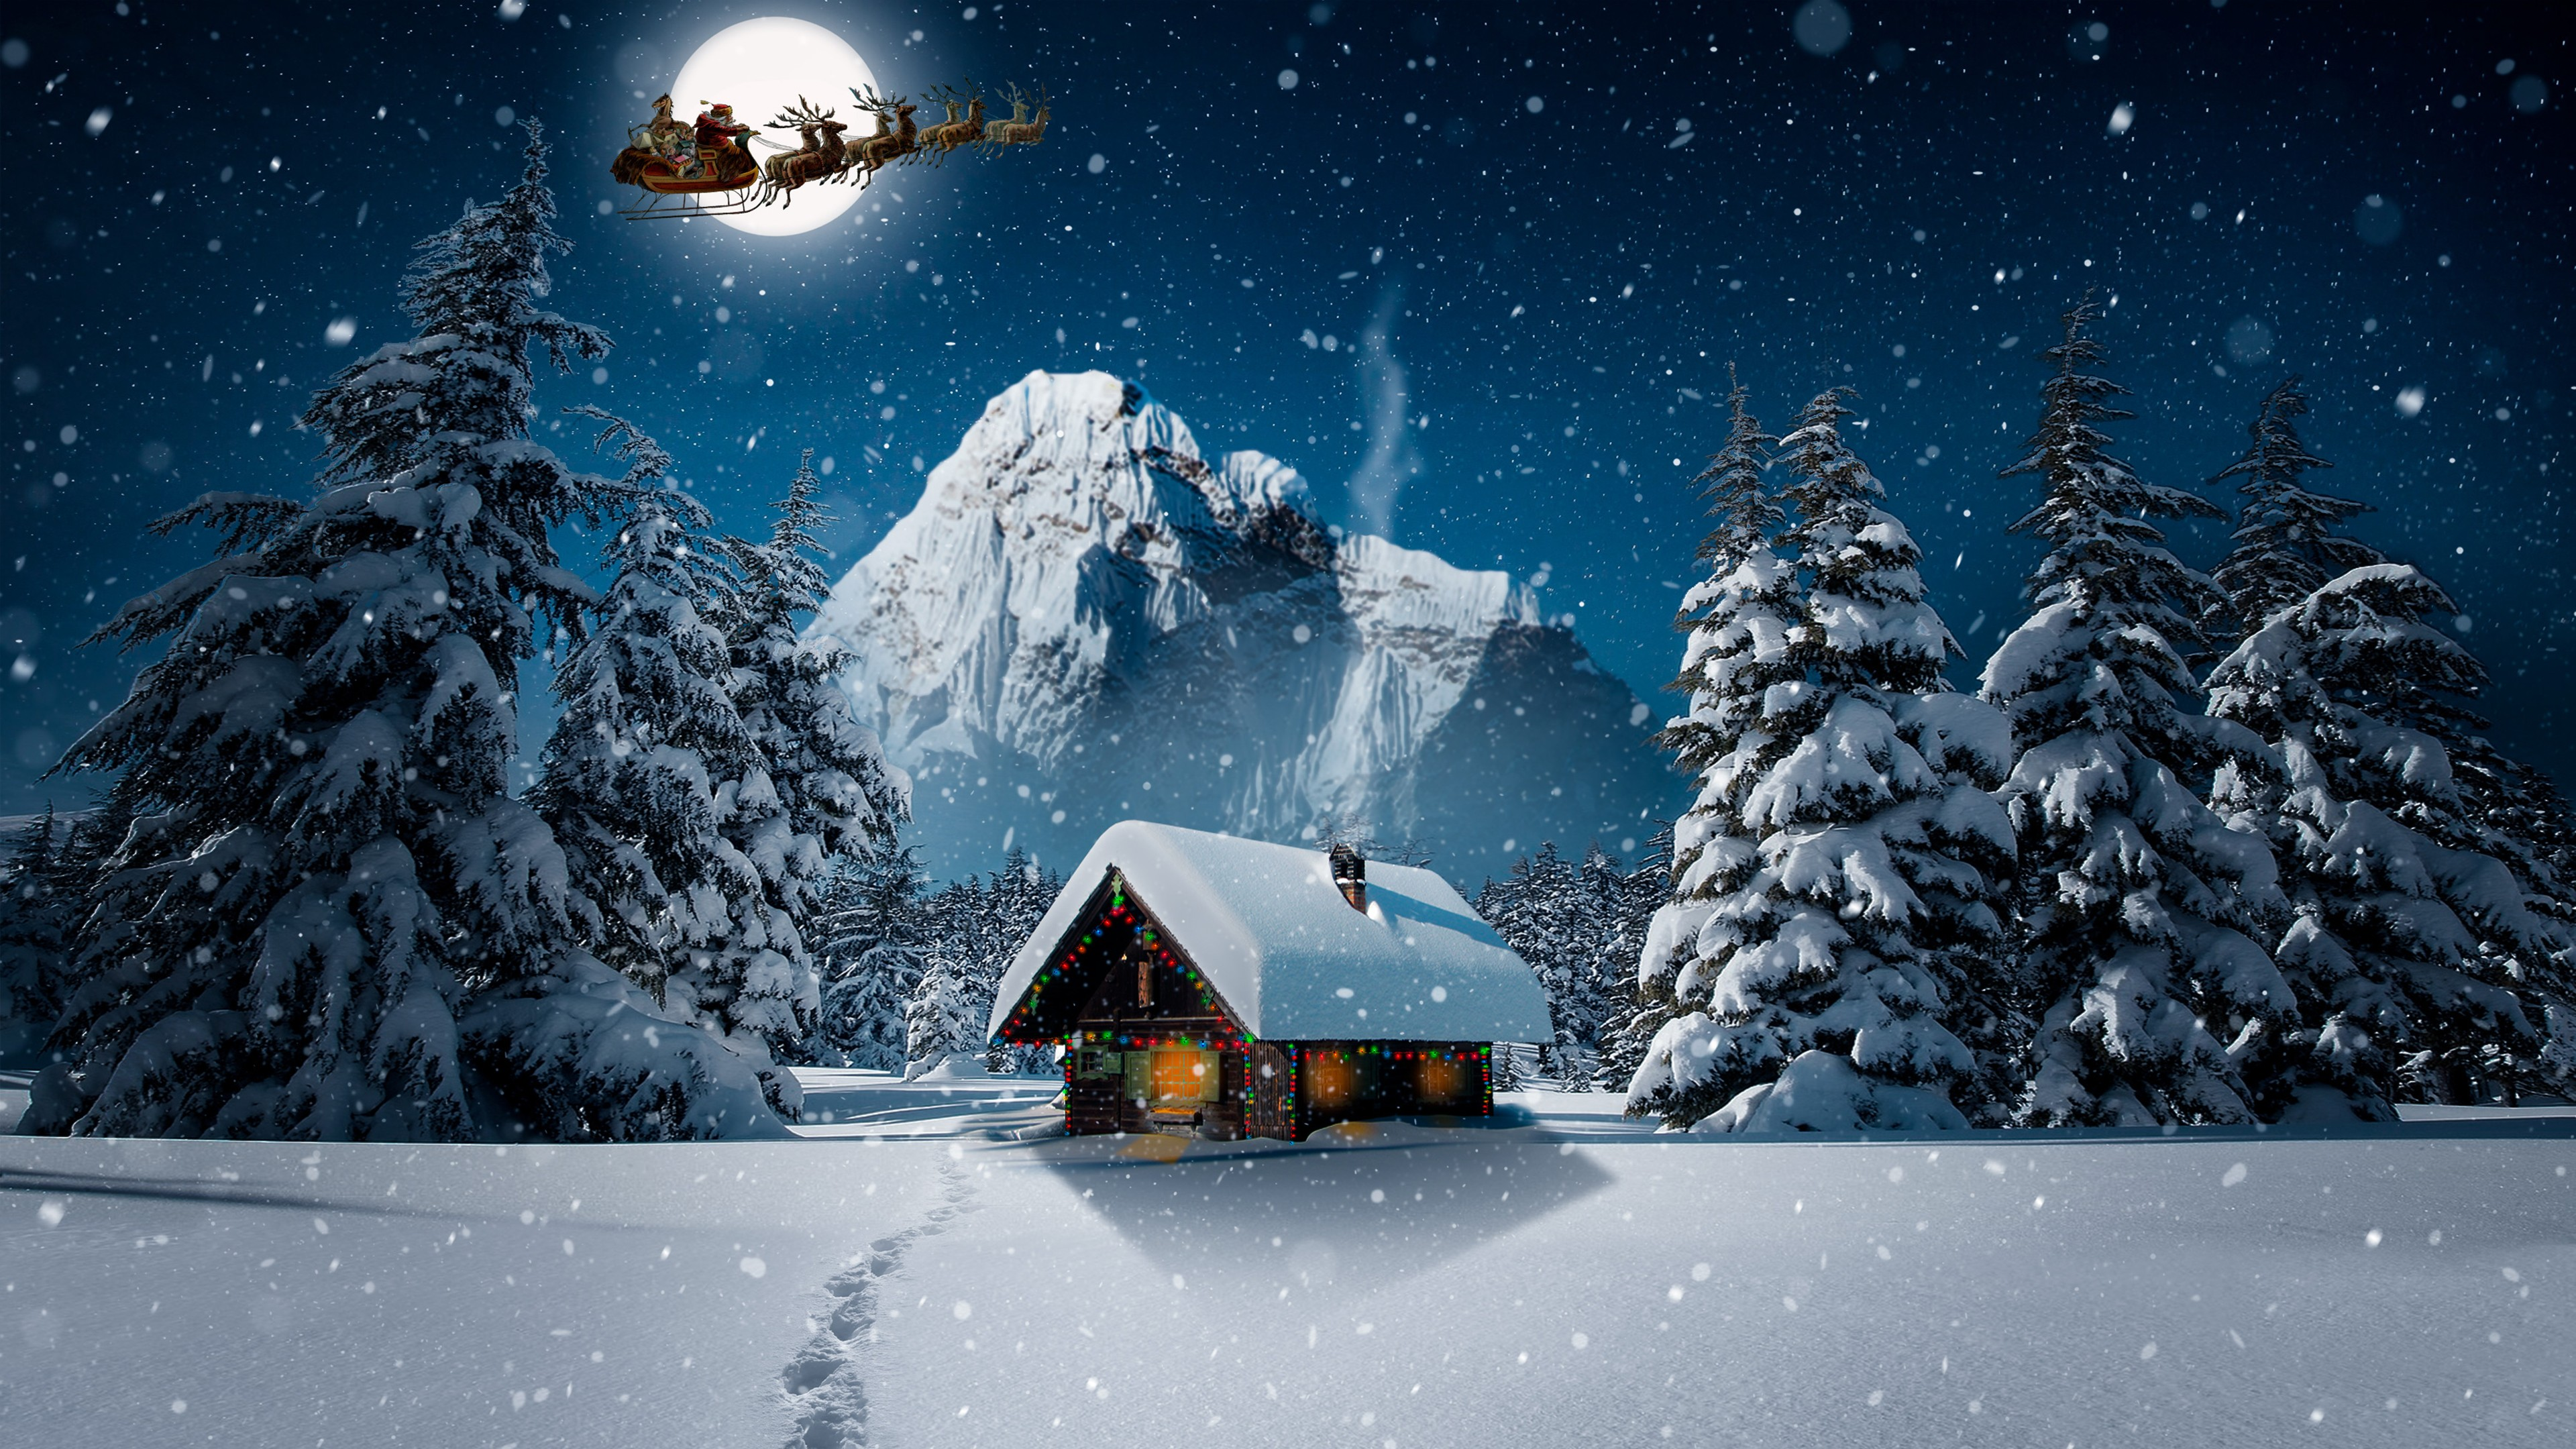 Christmas Wallpaper 4k - 1366x768 - Download HD Wallpaper ...